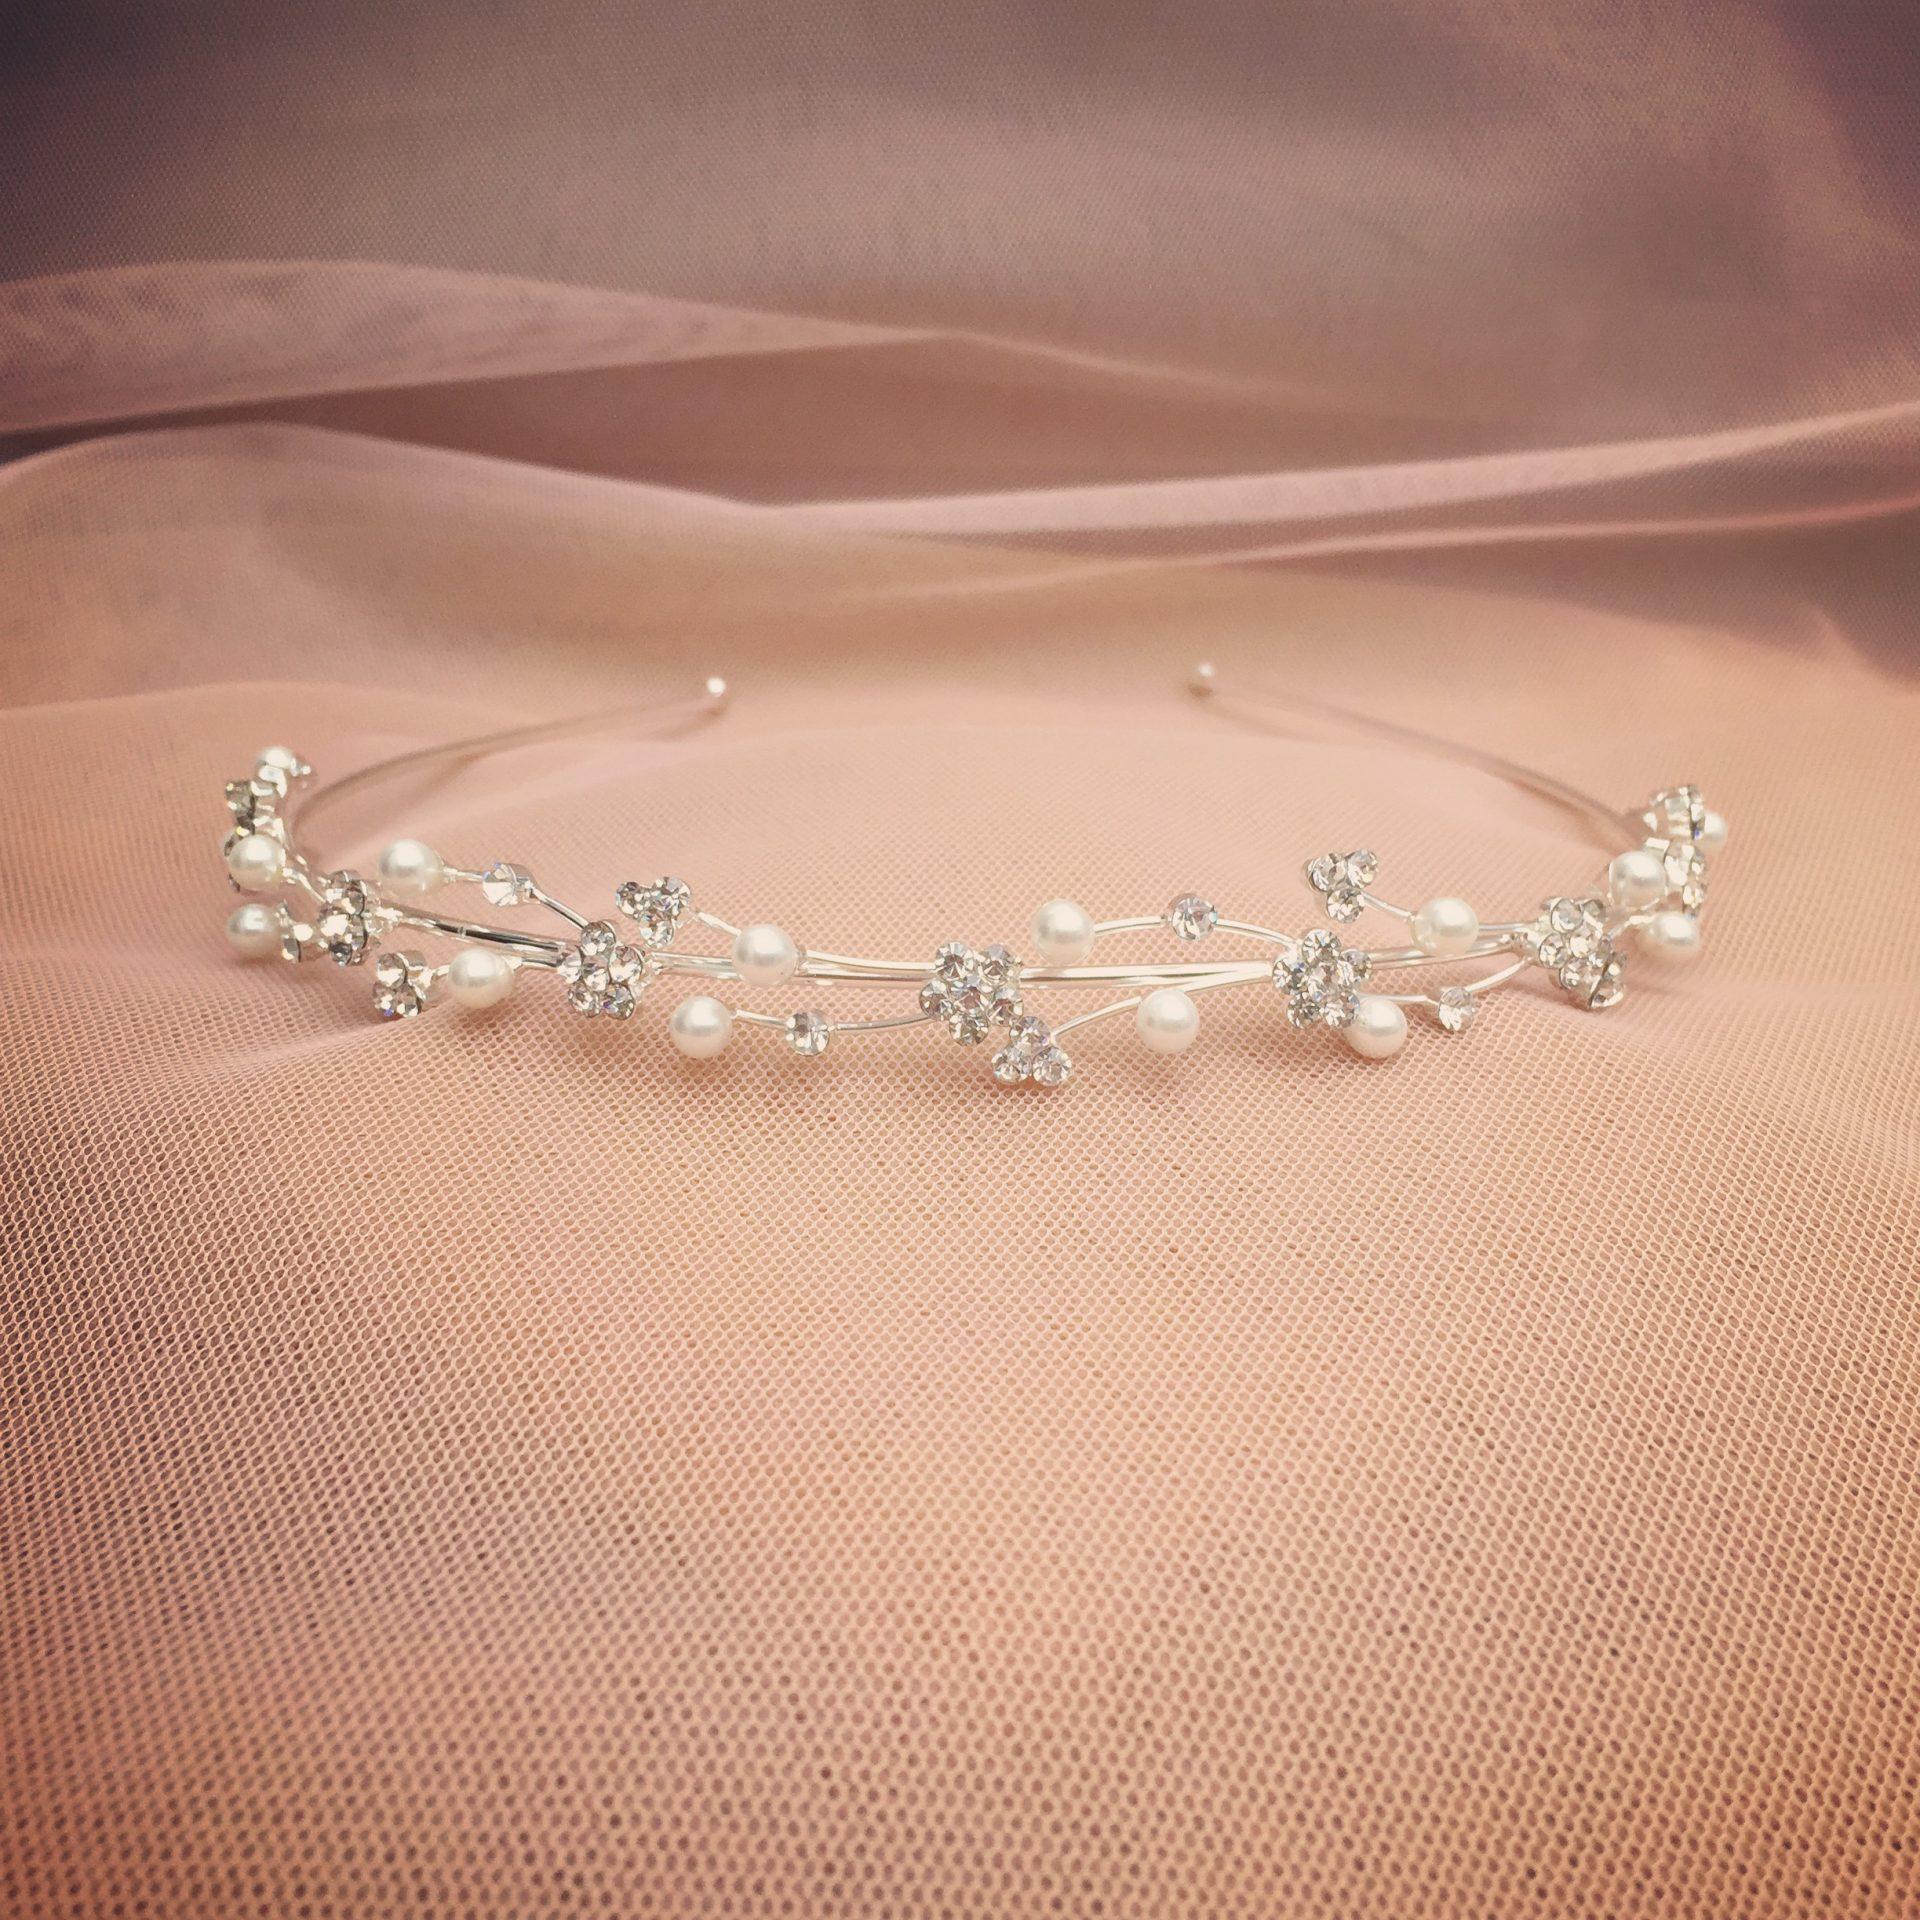 12. Sparkle & Pearl – Headband (i)